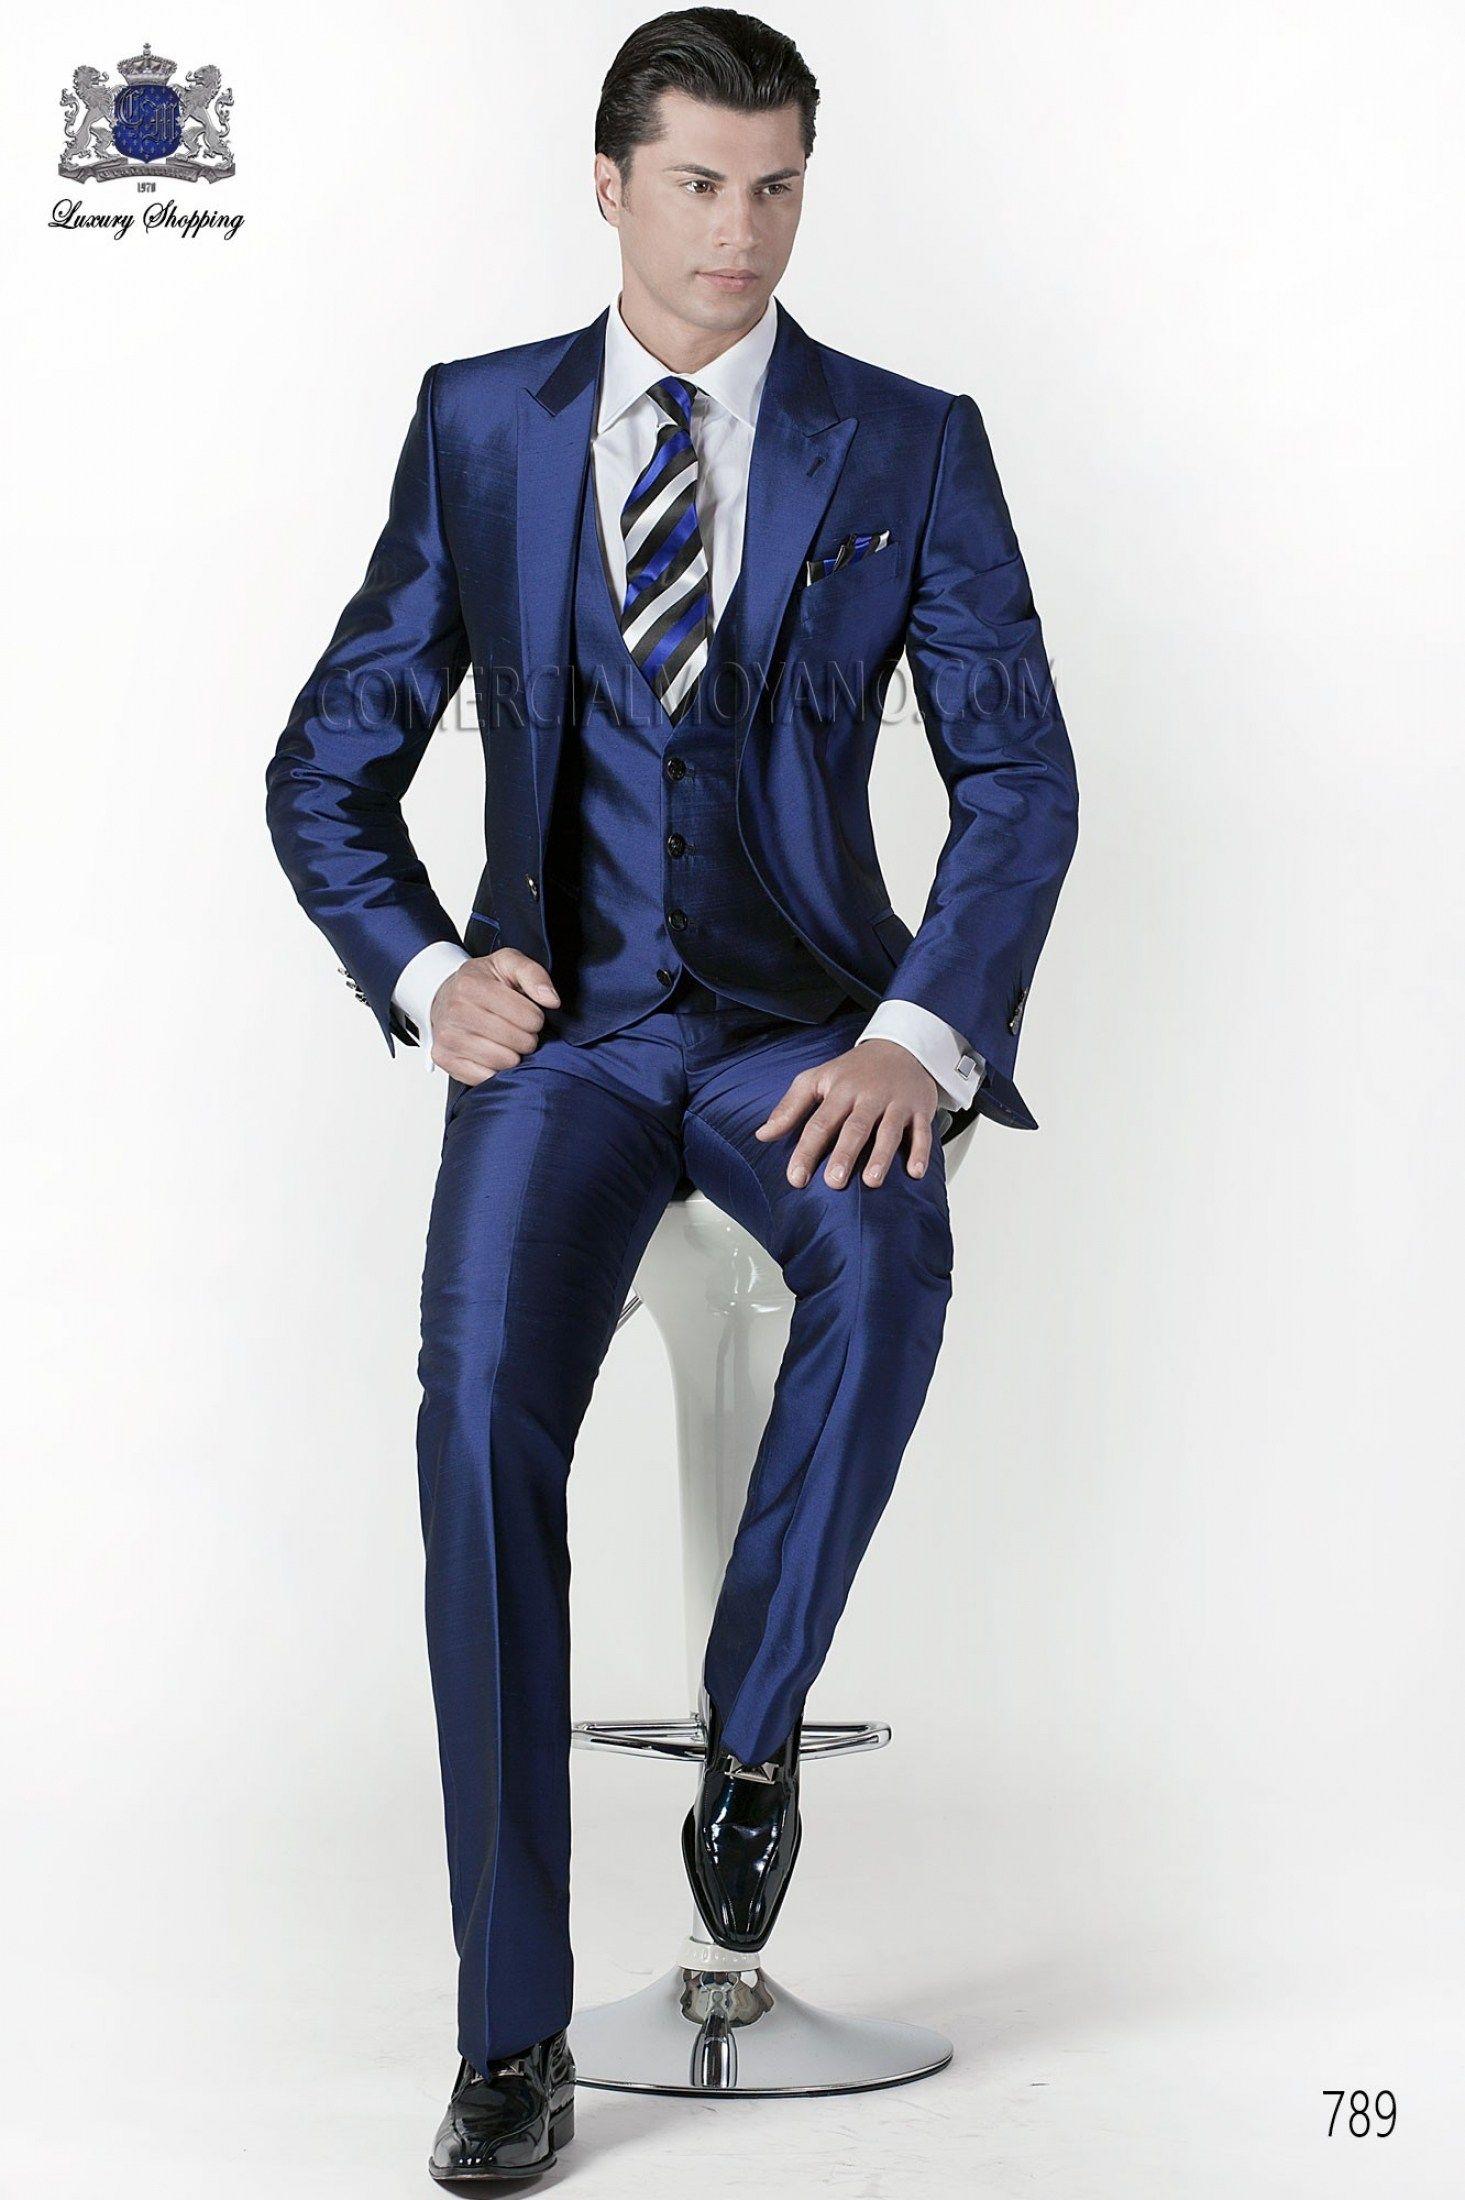 30 Beautiful Blue Suit Brown Shoes Wedding Ideas | Brown shoe ...